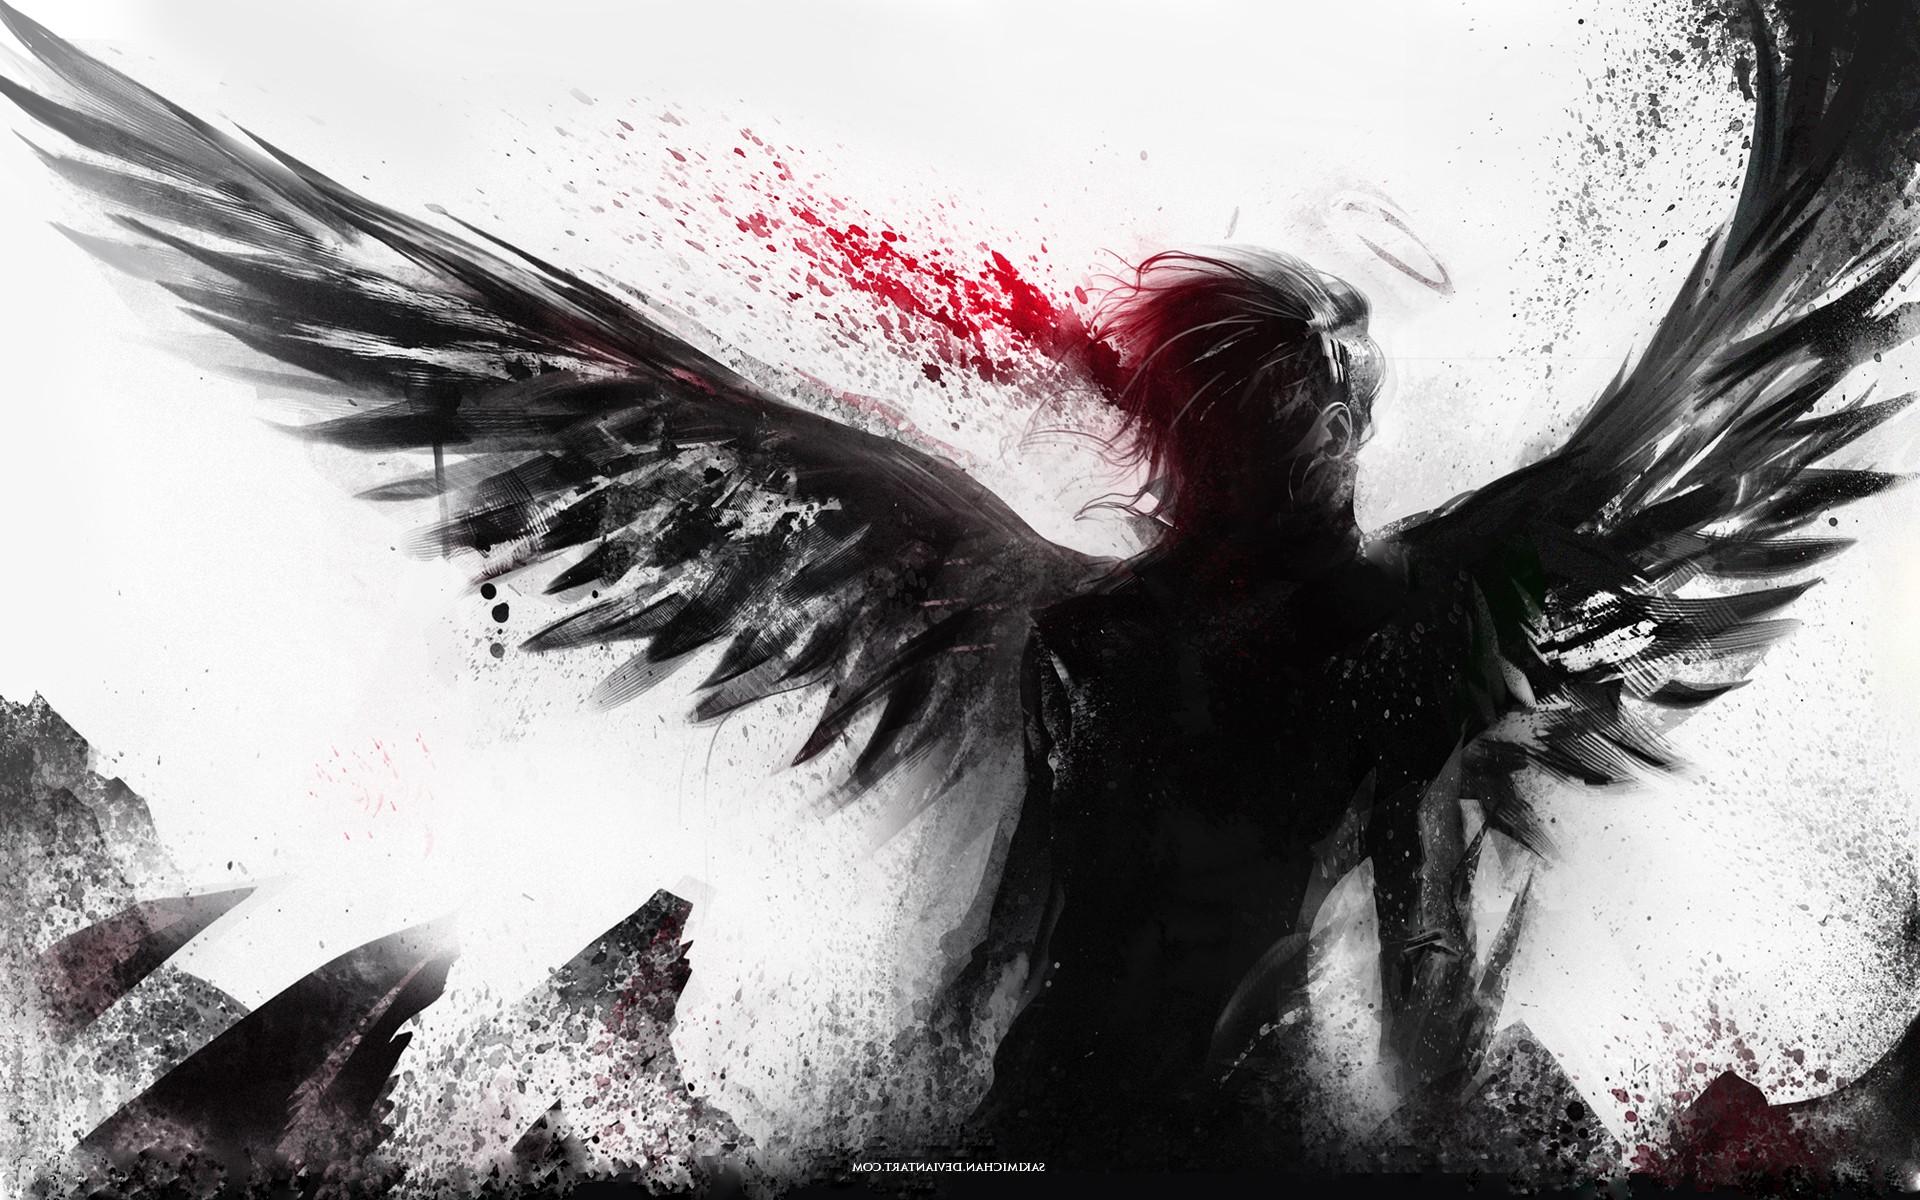 Wallpaper Fantasy Art Abstract Wings Angel Beak Blood